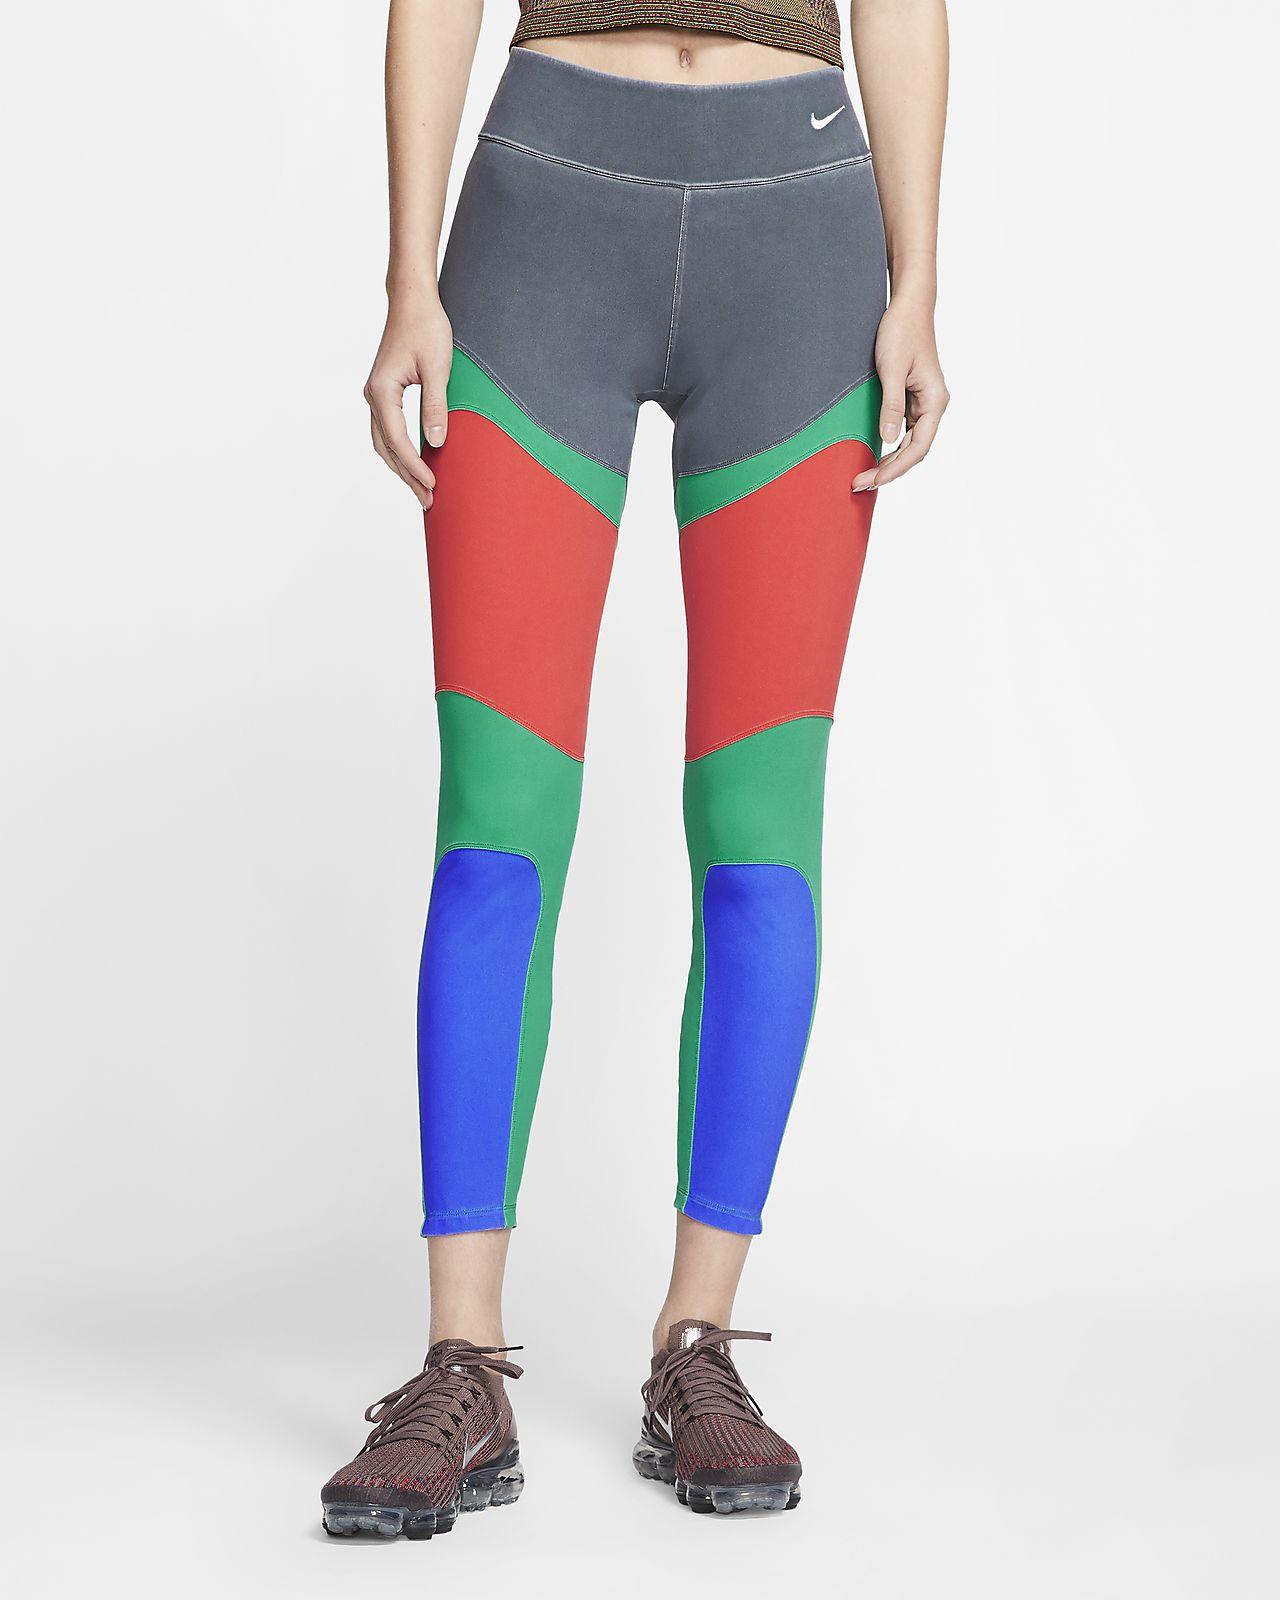 Nike Made In Italy Leggings